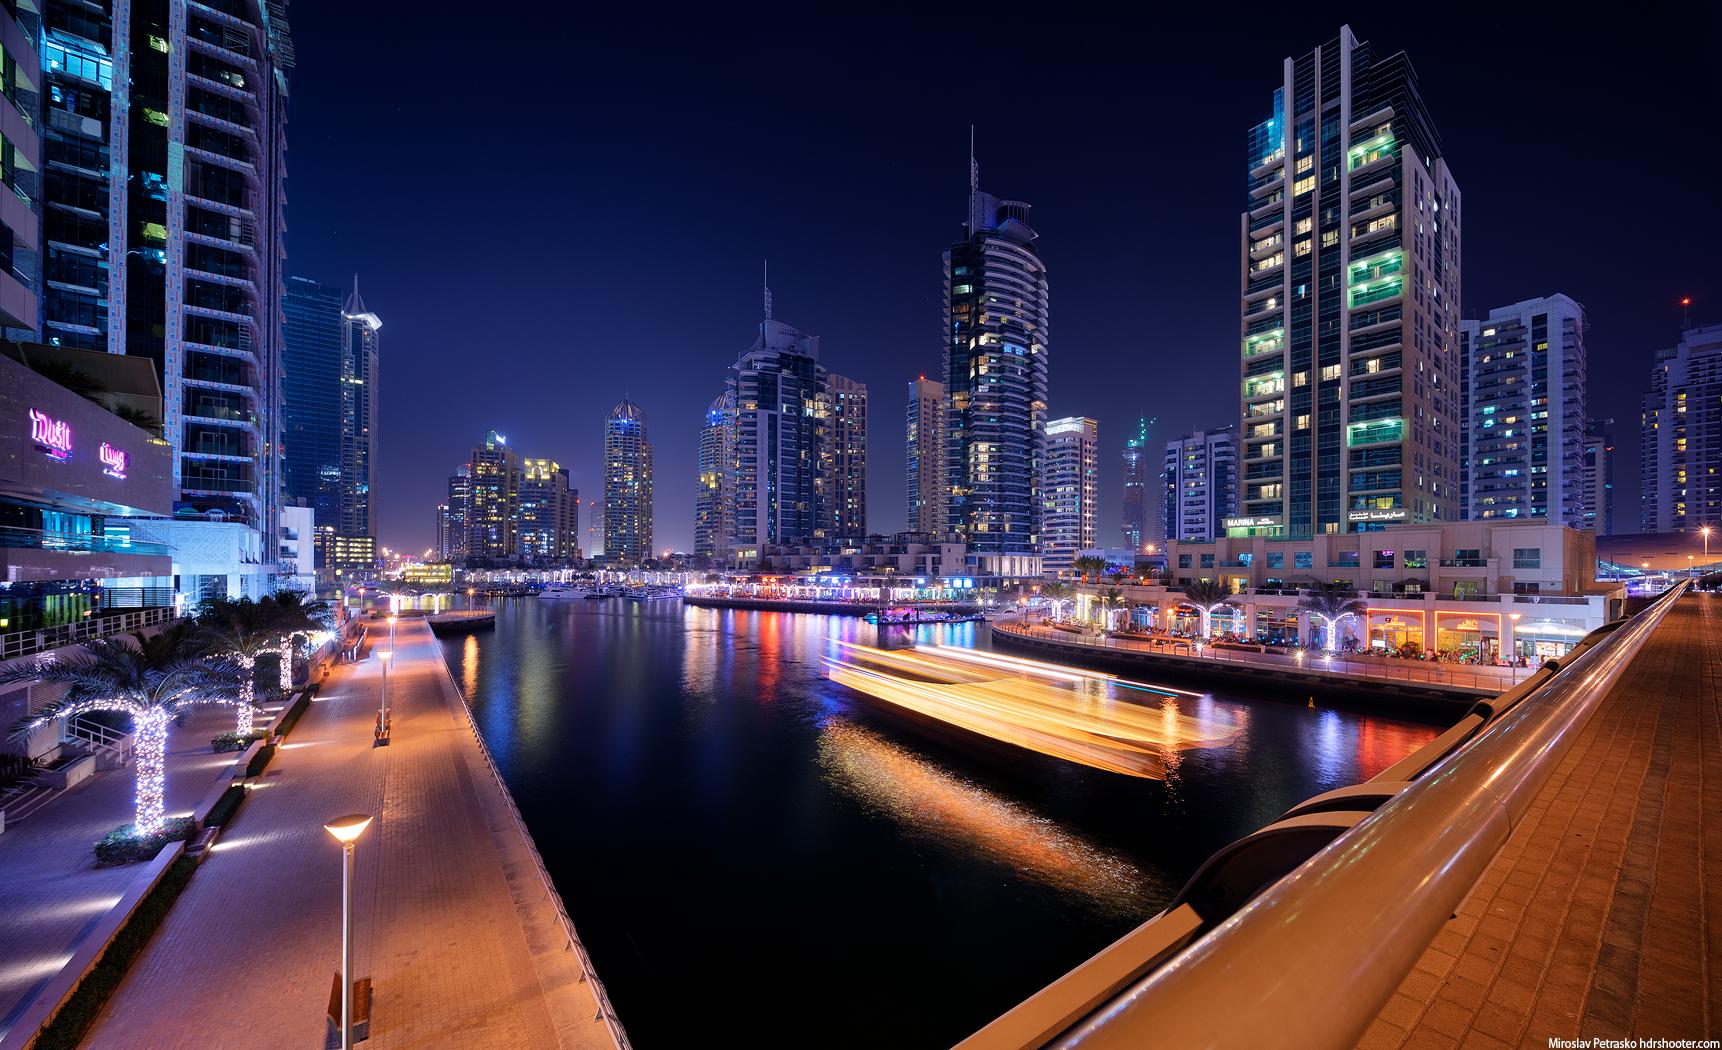 Dubai 4k Wallpapers Hdrshooter